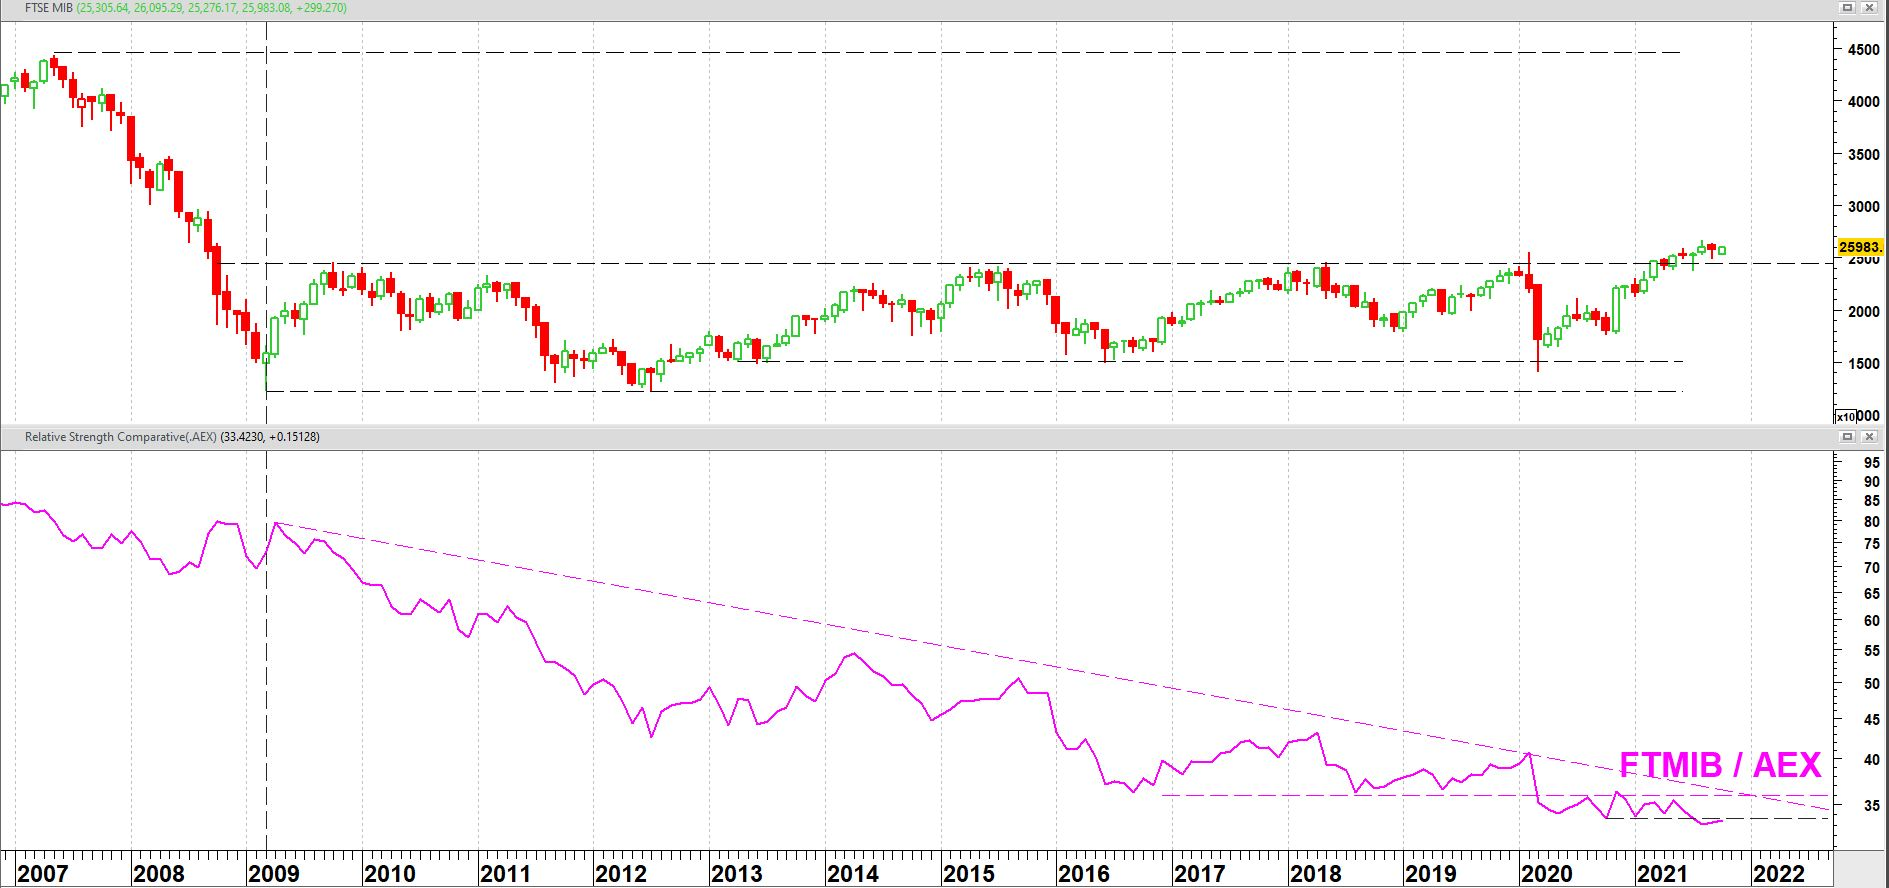 FTSE MIB aandelenindex vanaf 2007 + relatieve sterkte t.o.v. AEX-index